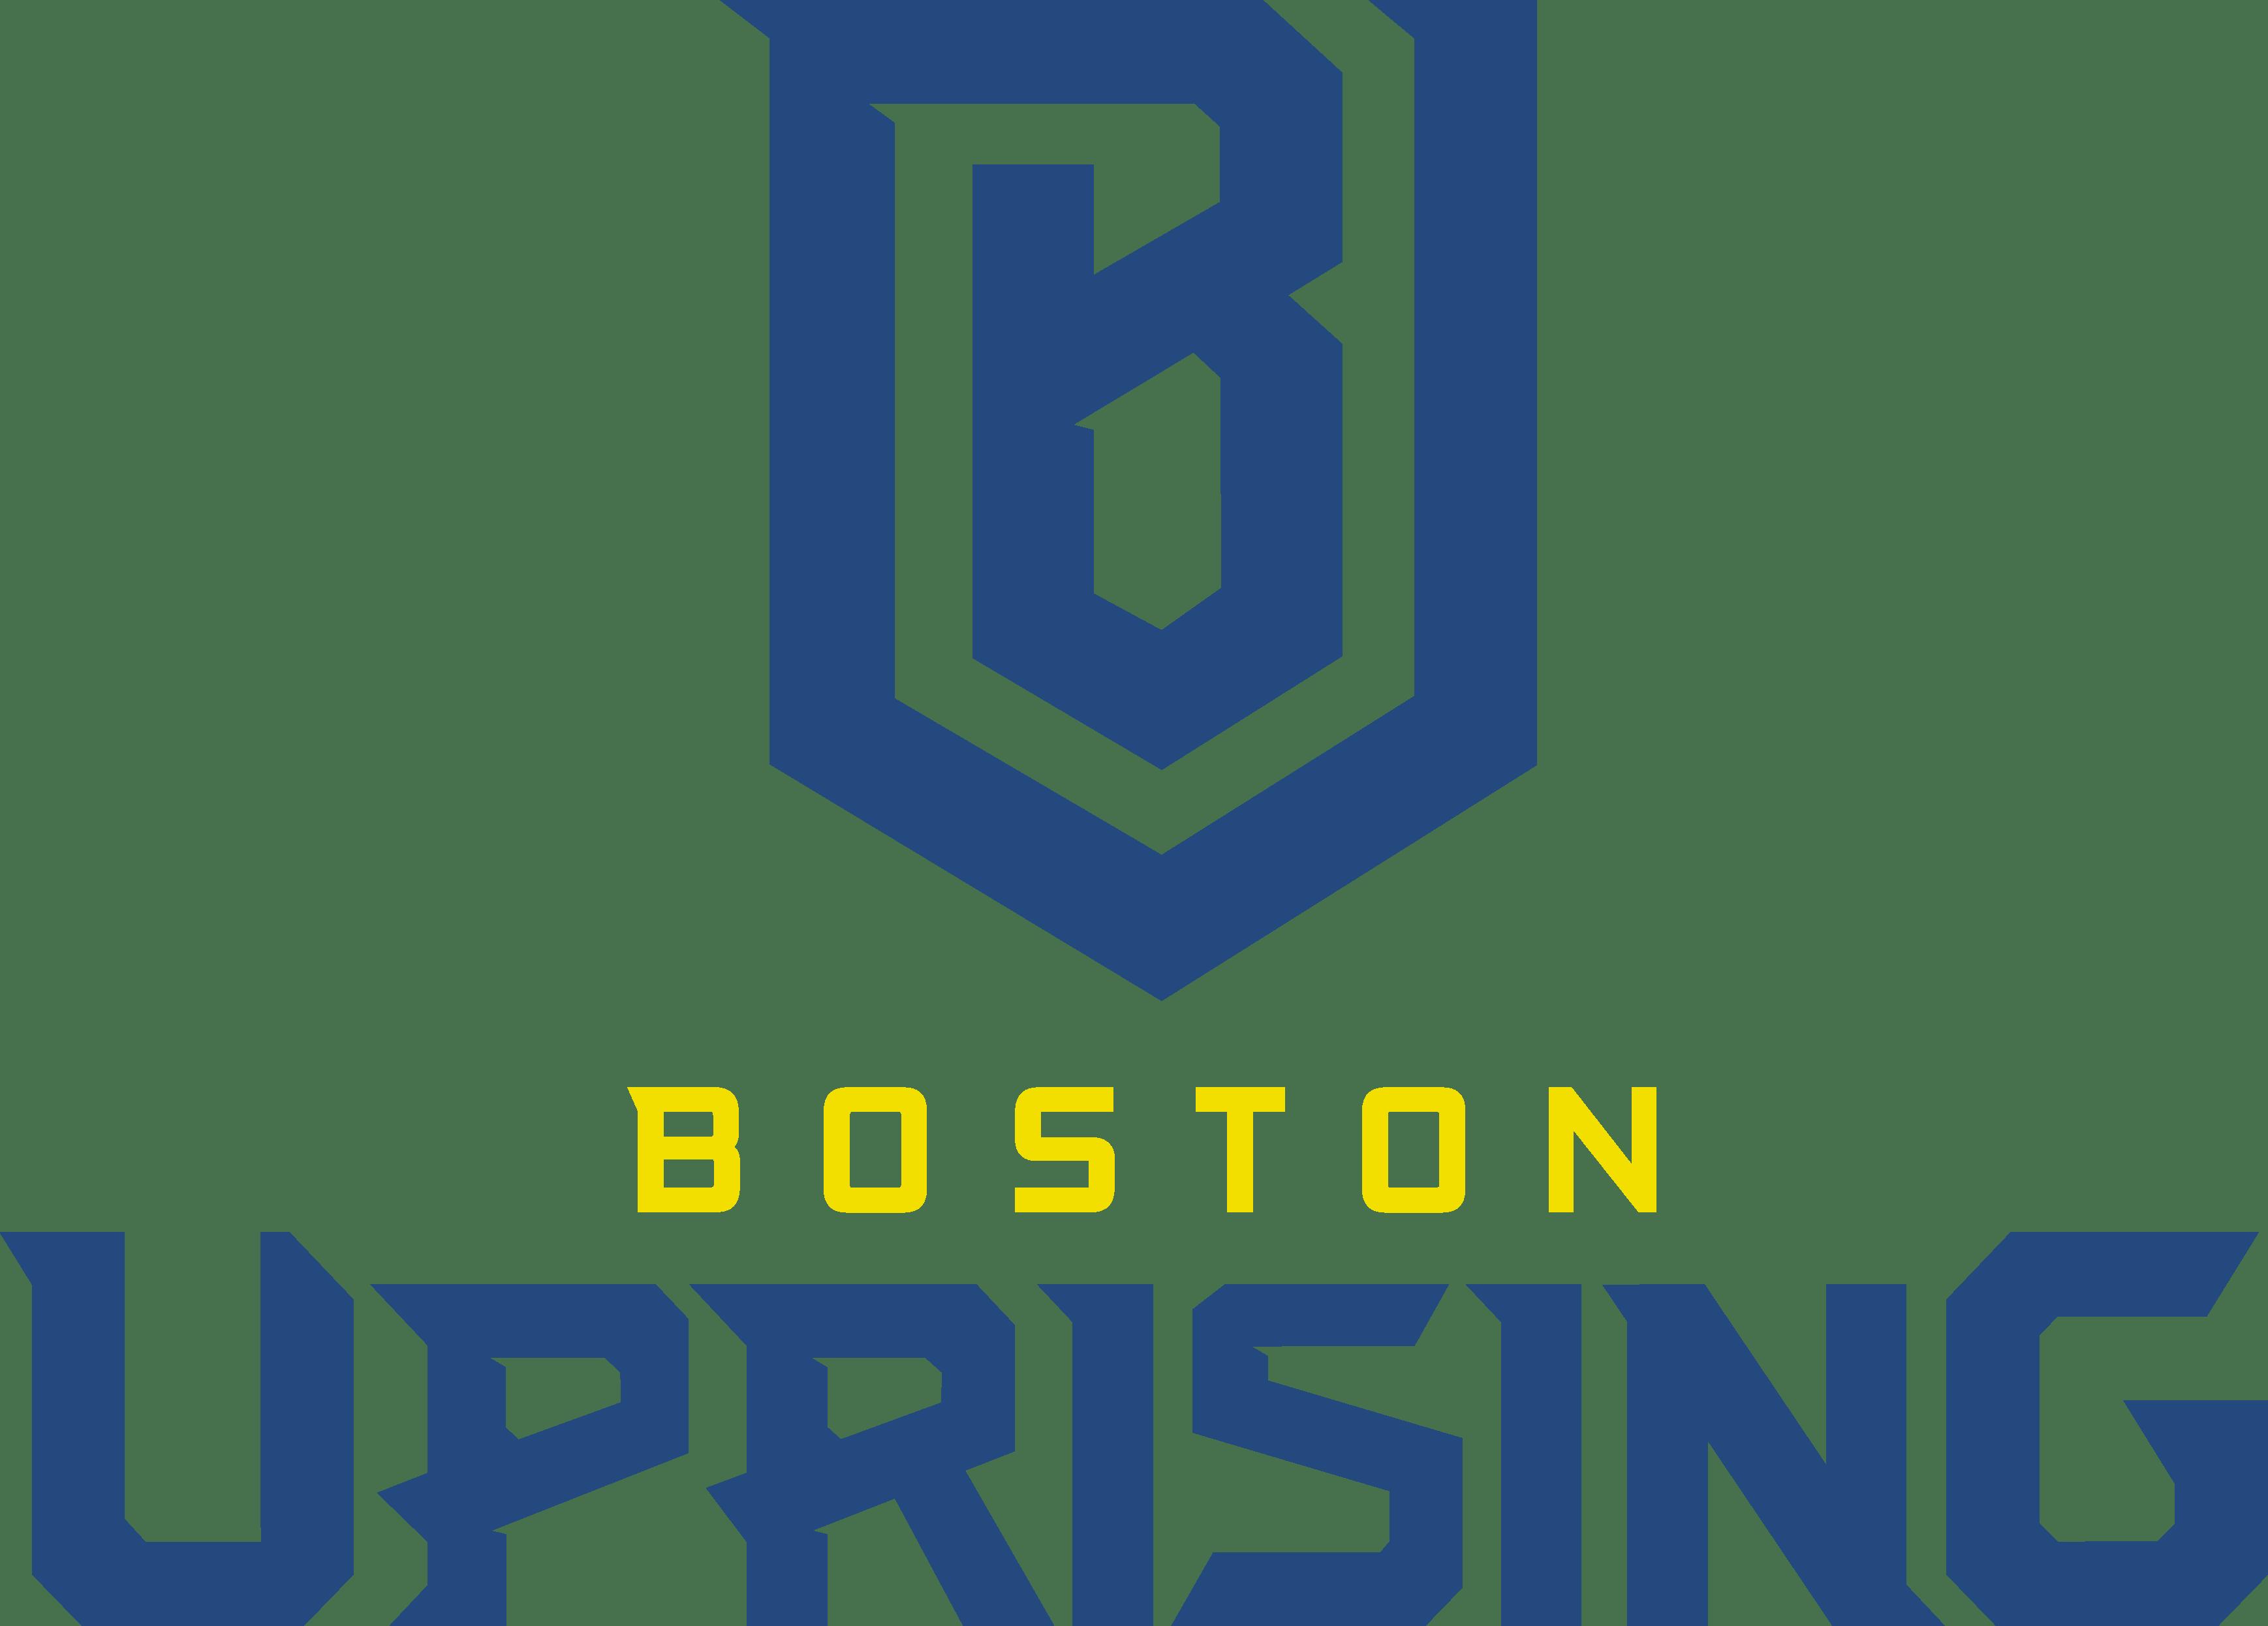 Boston Uprising